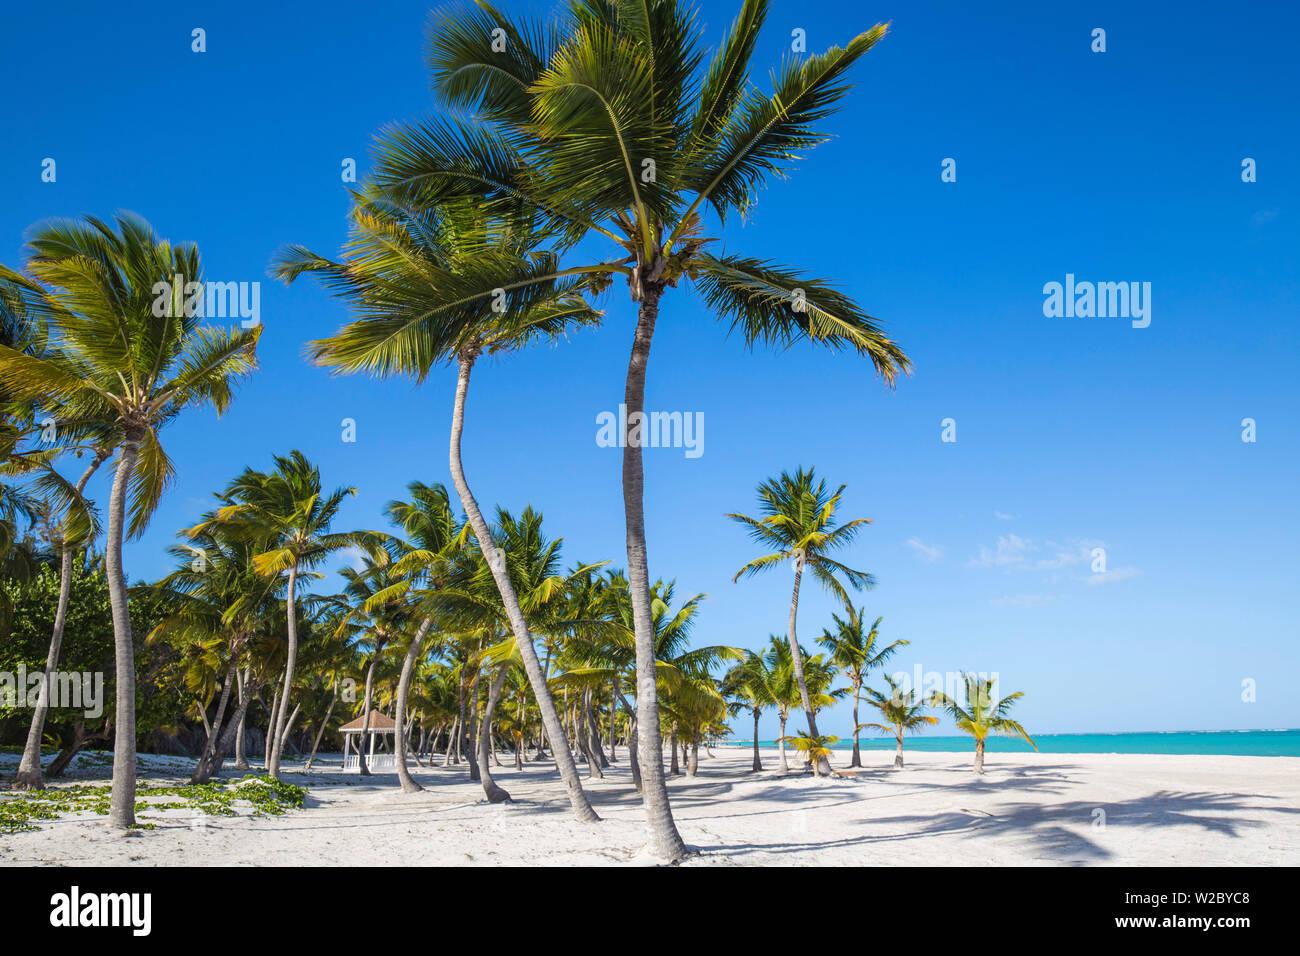 República Dominicana, Punta Cana, Cap Cana, Juanillo Beach Foto de stock